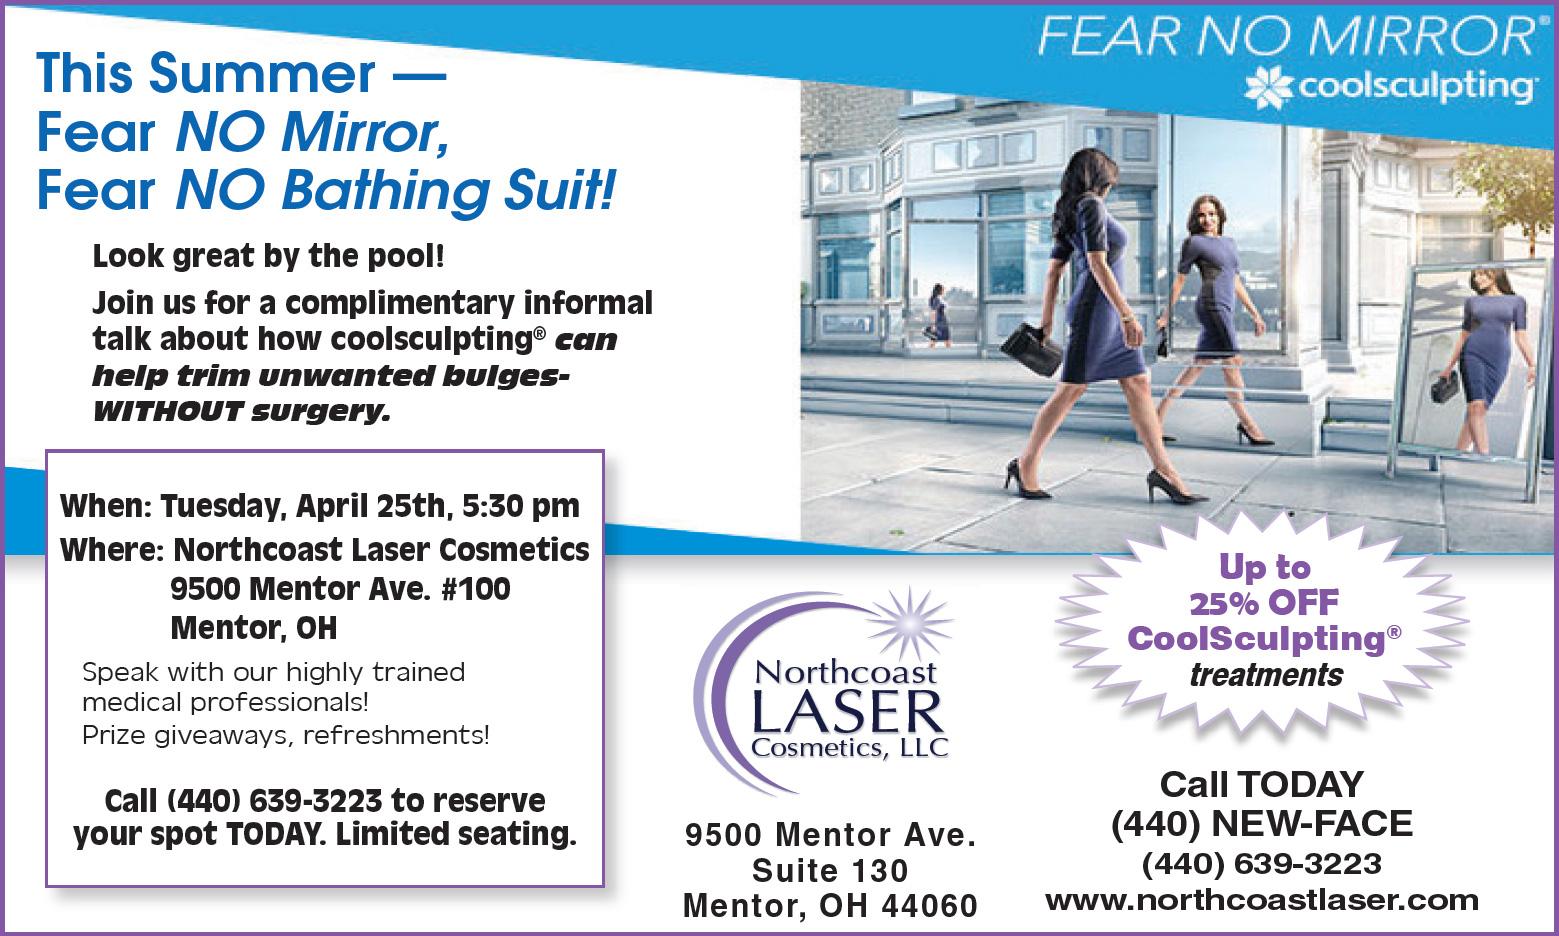 This Summer - Fear NO Mirror, Fear NO Bathing Suit! - Northcoast Laser Cosmetics, LLC